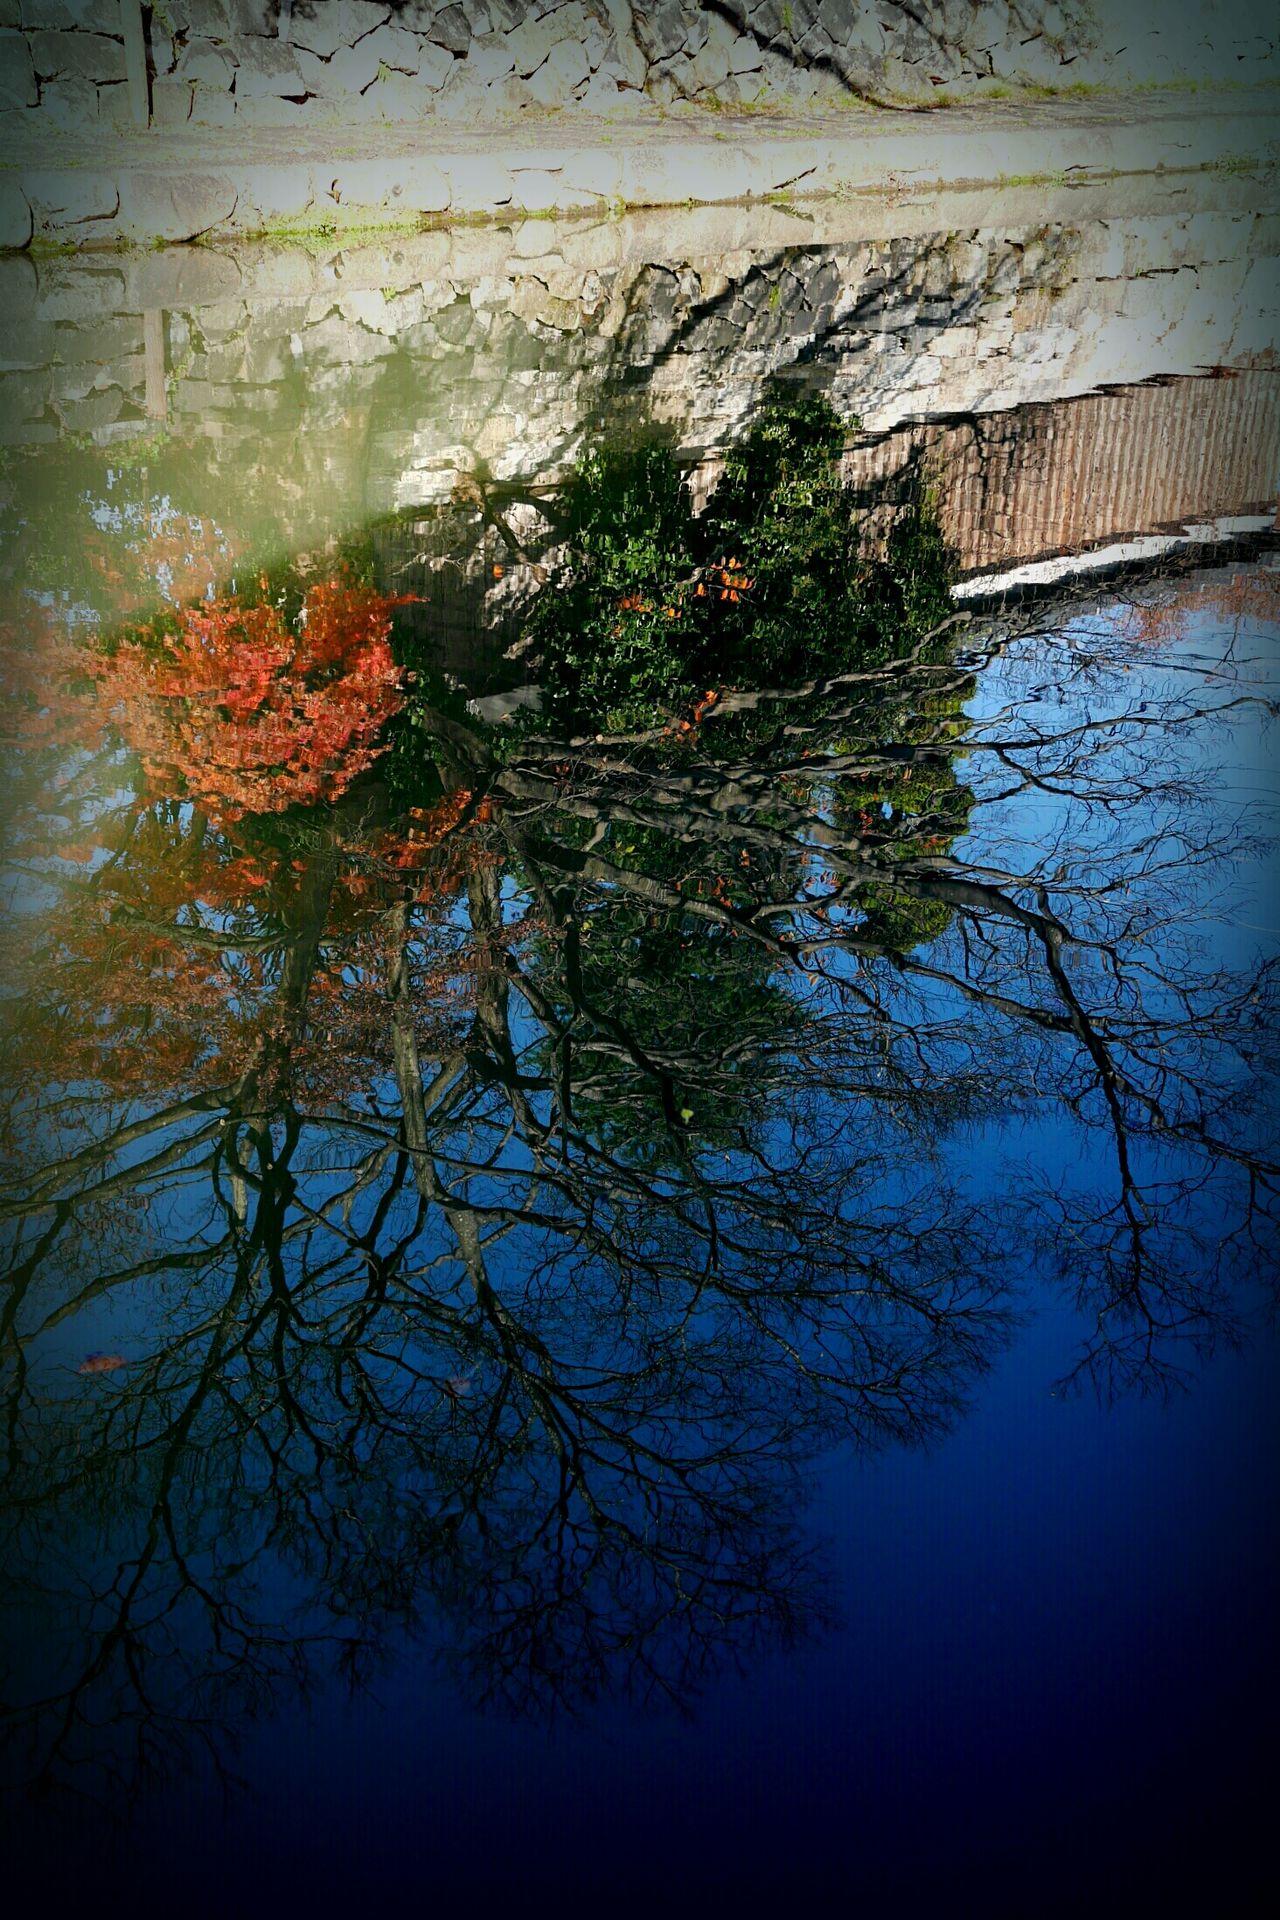 Waterway Ōmihachiman Shiga,Japan Winter Water Reflection Calm Tree Sky